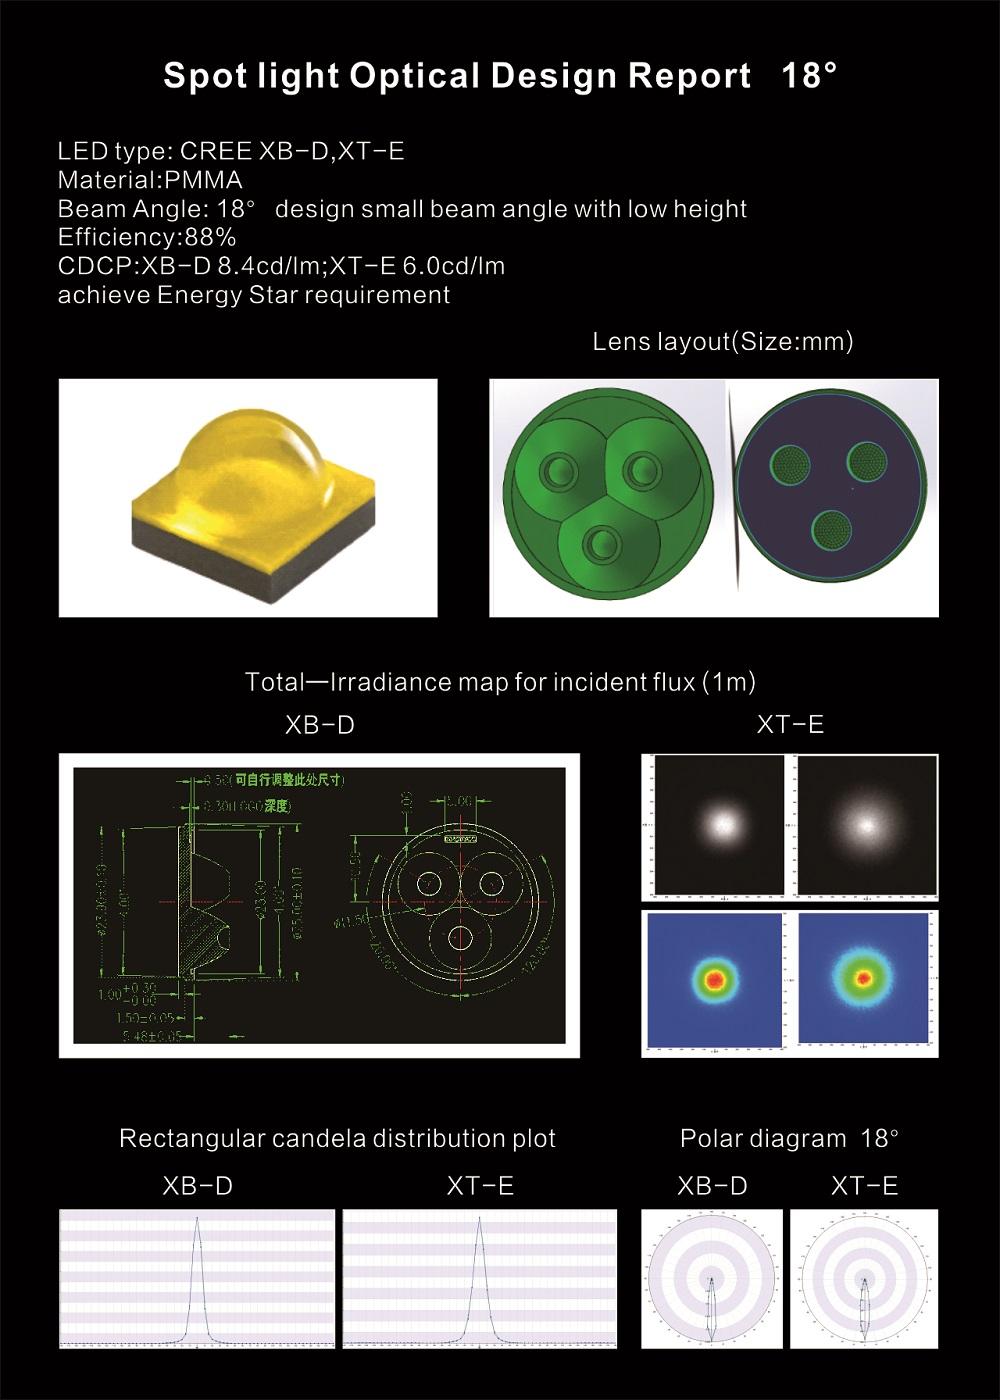 spot lighting design asahi optics. Black Bedroom Furniture Sets. Home Design Ideas